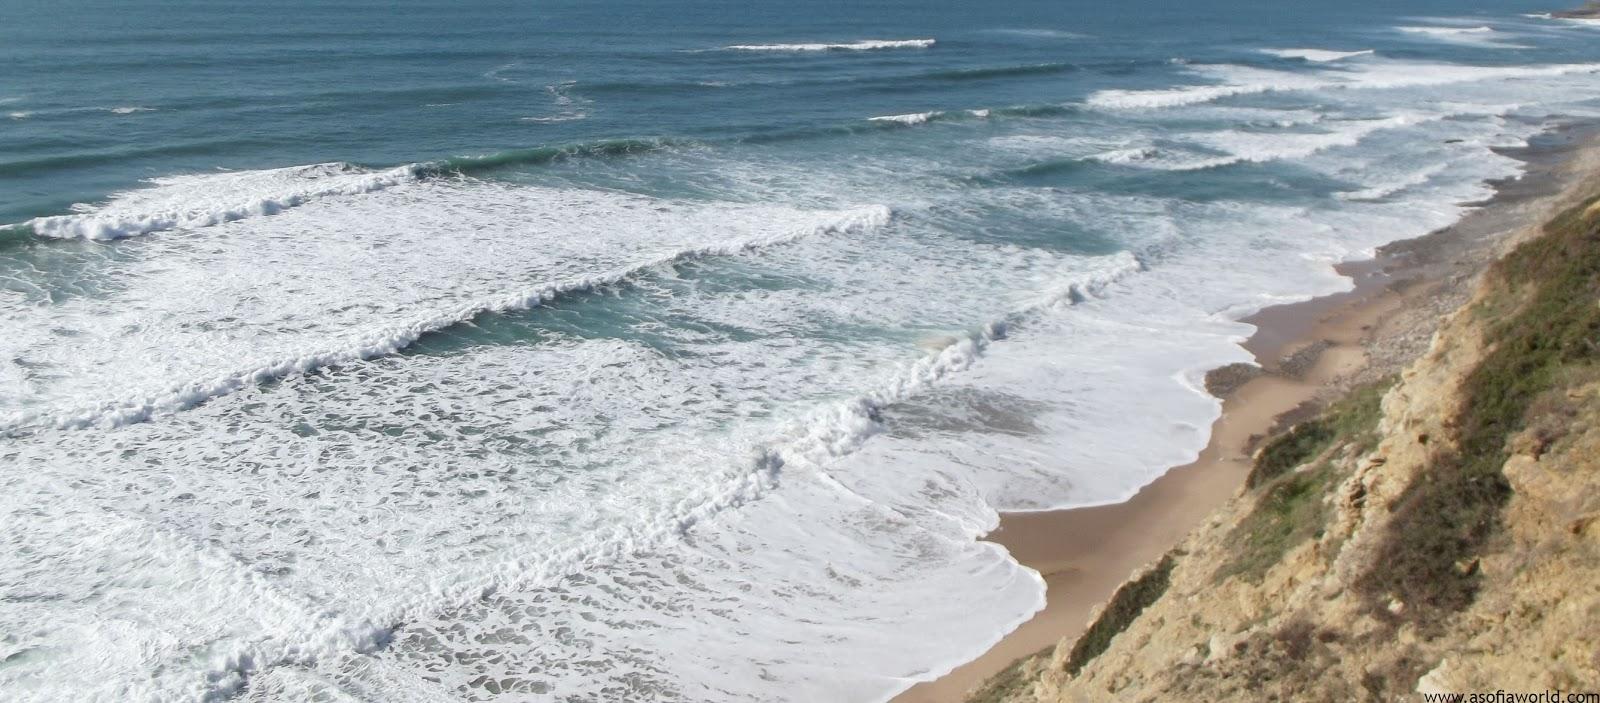 Praia da Aguda, Sintra